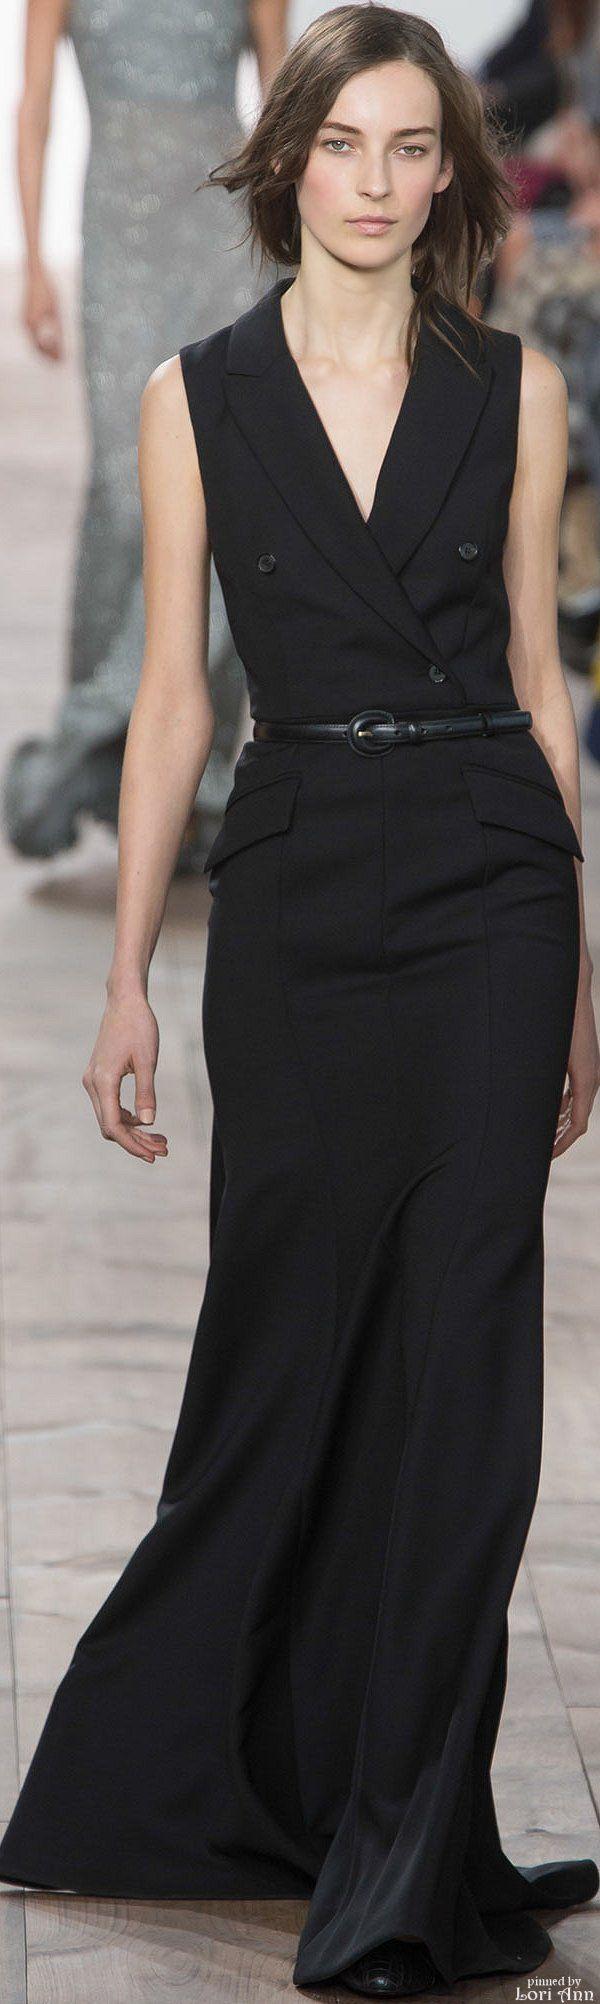 Michael Kors Fall 2015 RTW// beatiful business or funeral attire